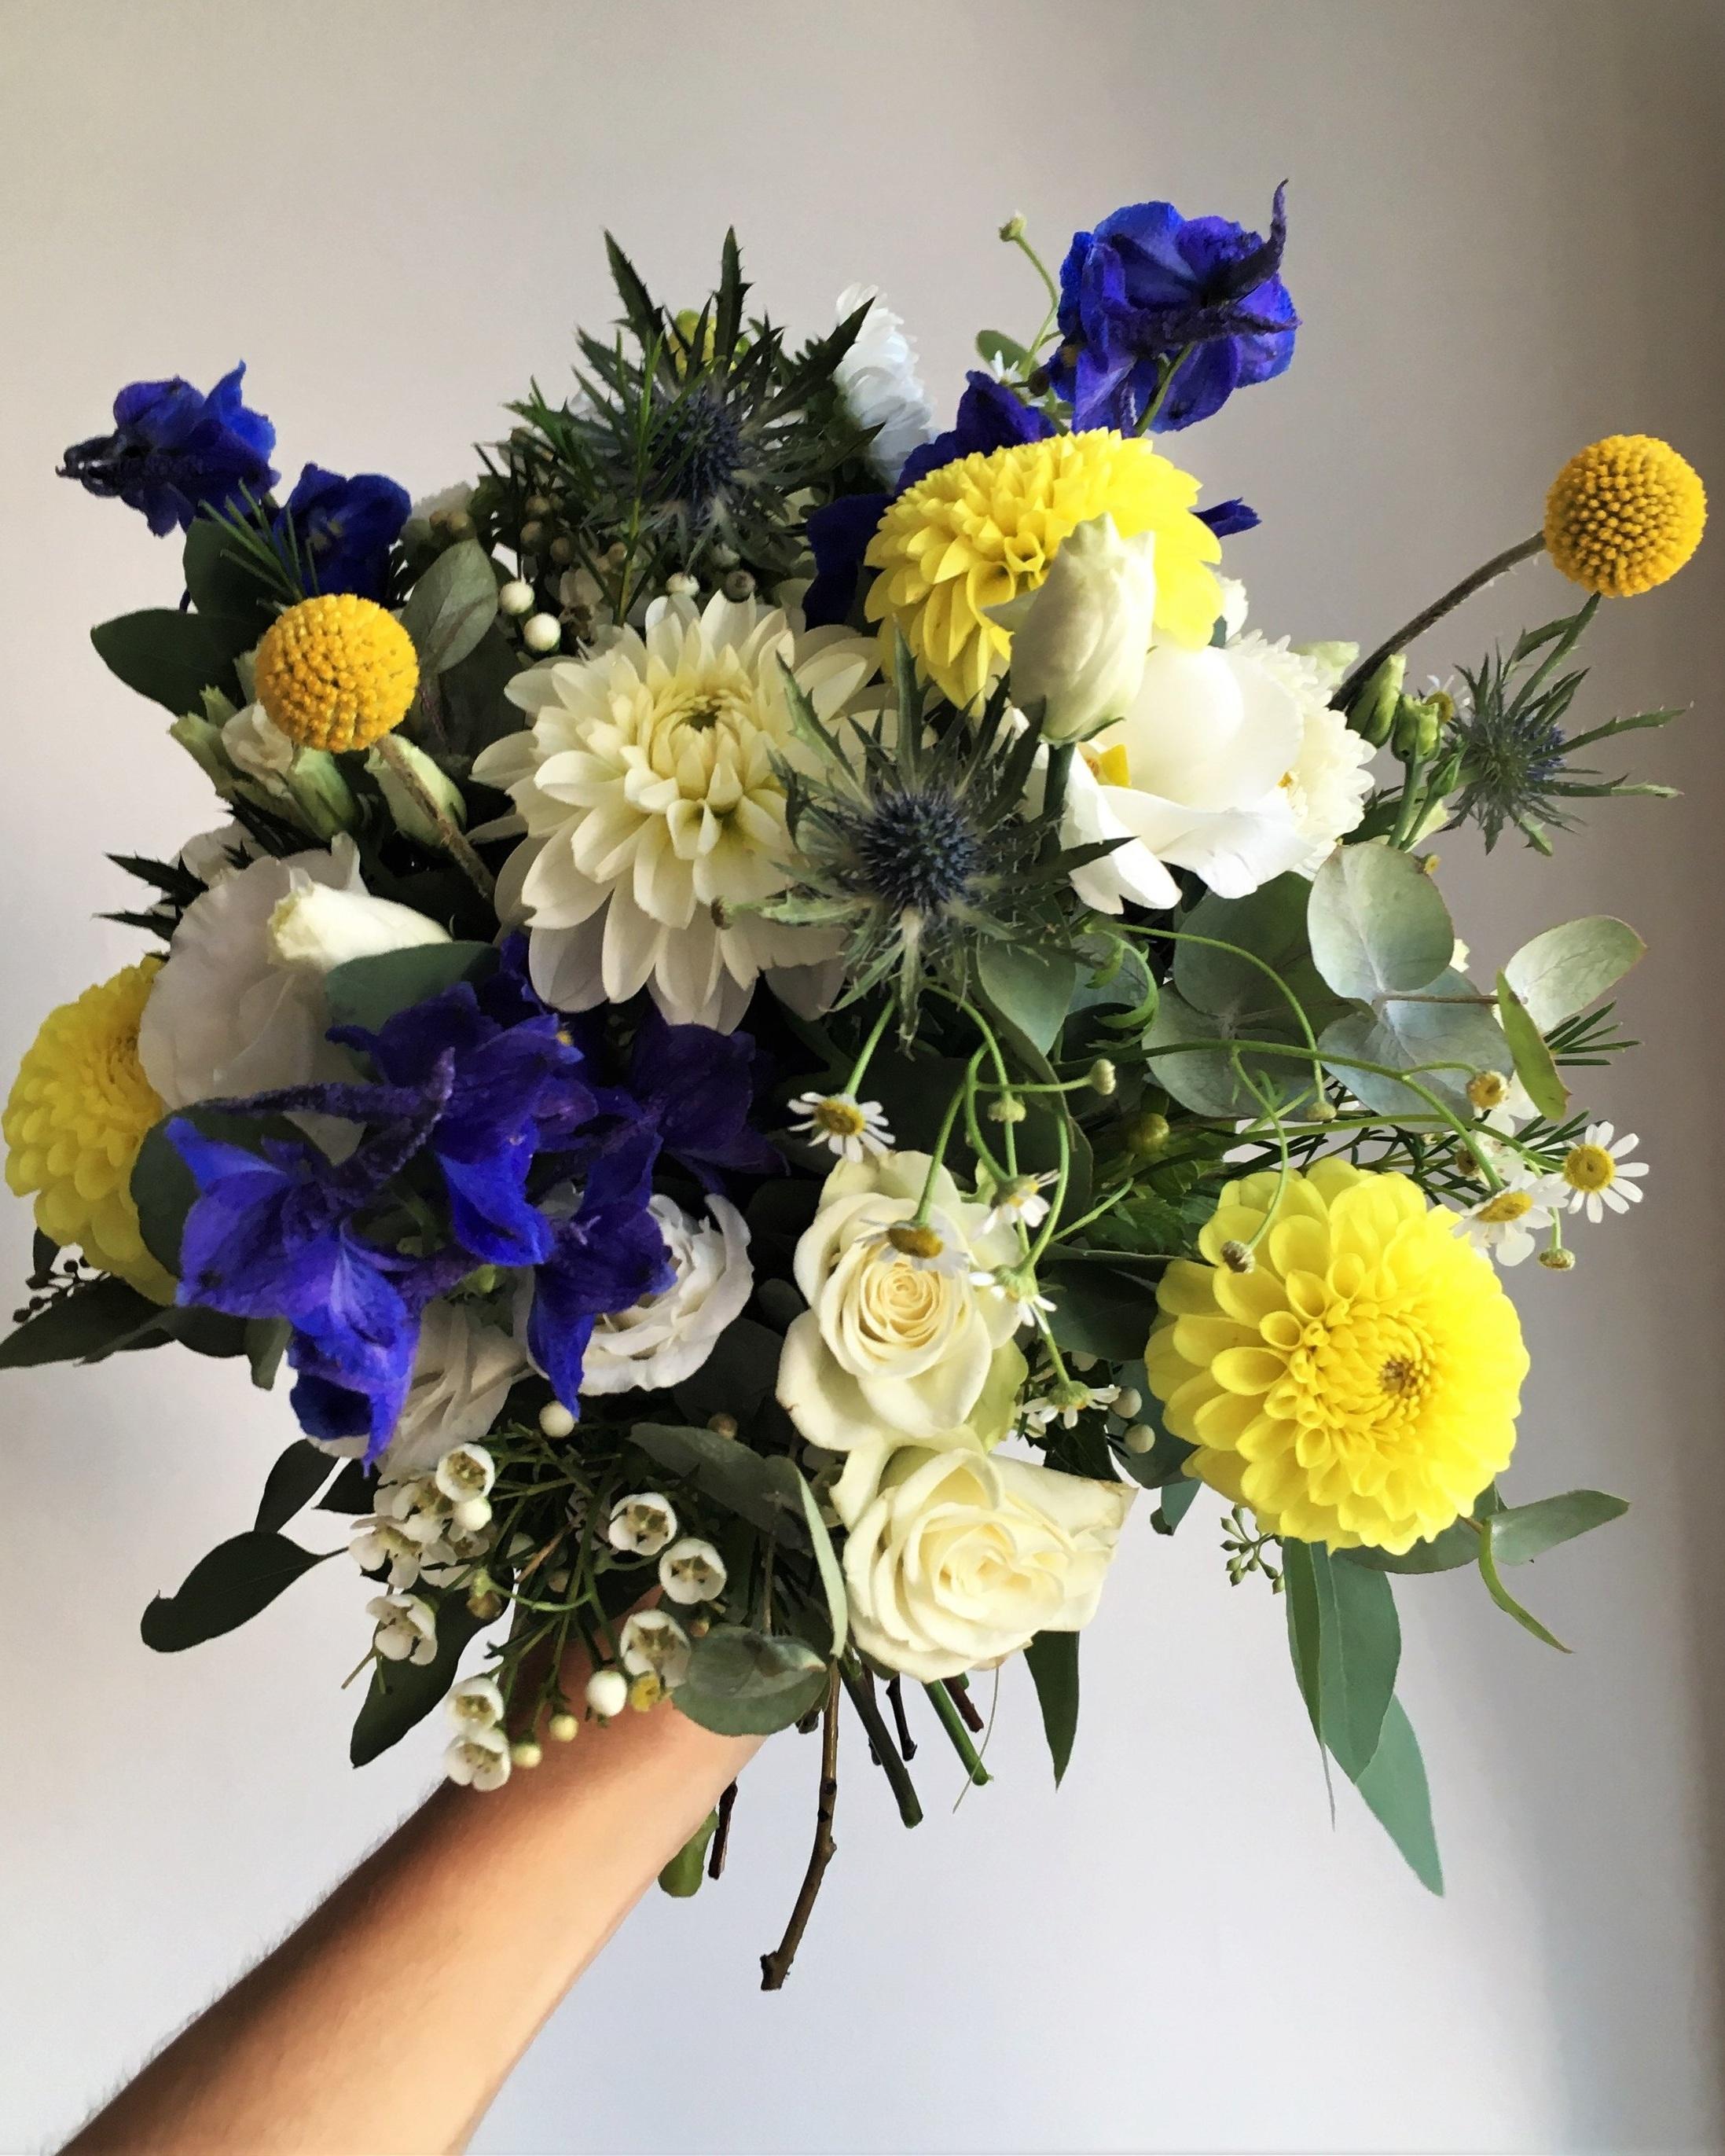 Wedding-Flowers-Brighton-Sussex-Florist-Bridal-Webb-and-Farrer%2B%25289%2529.jpg